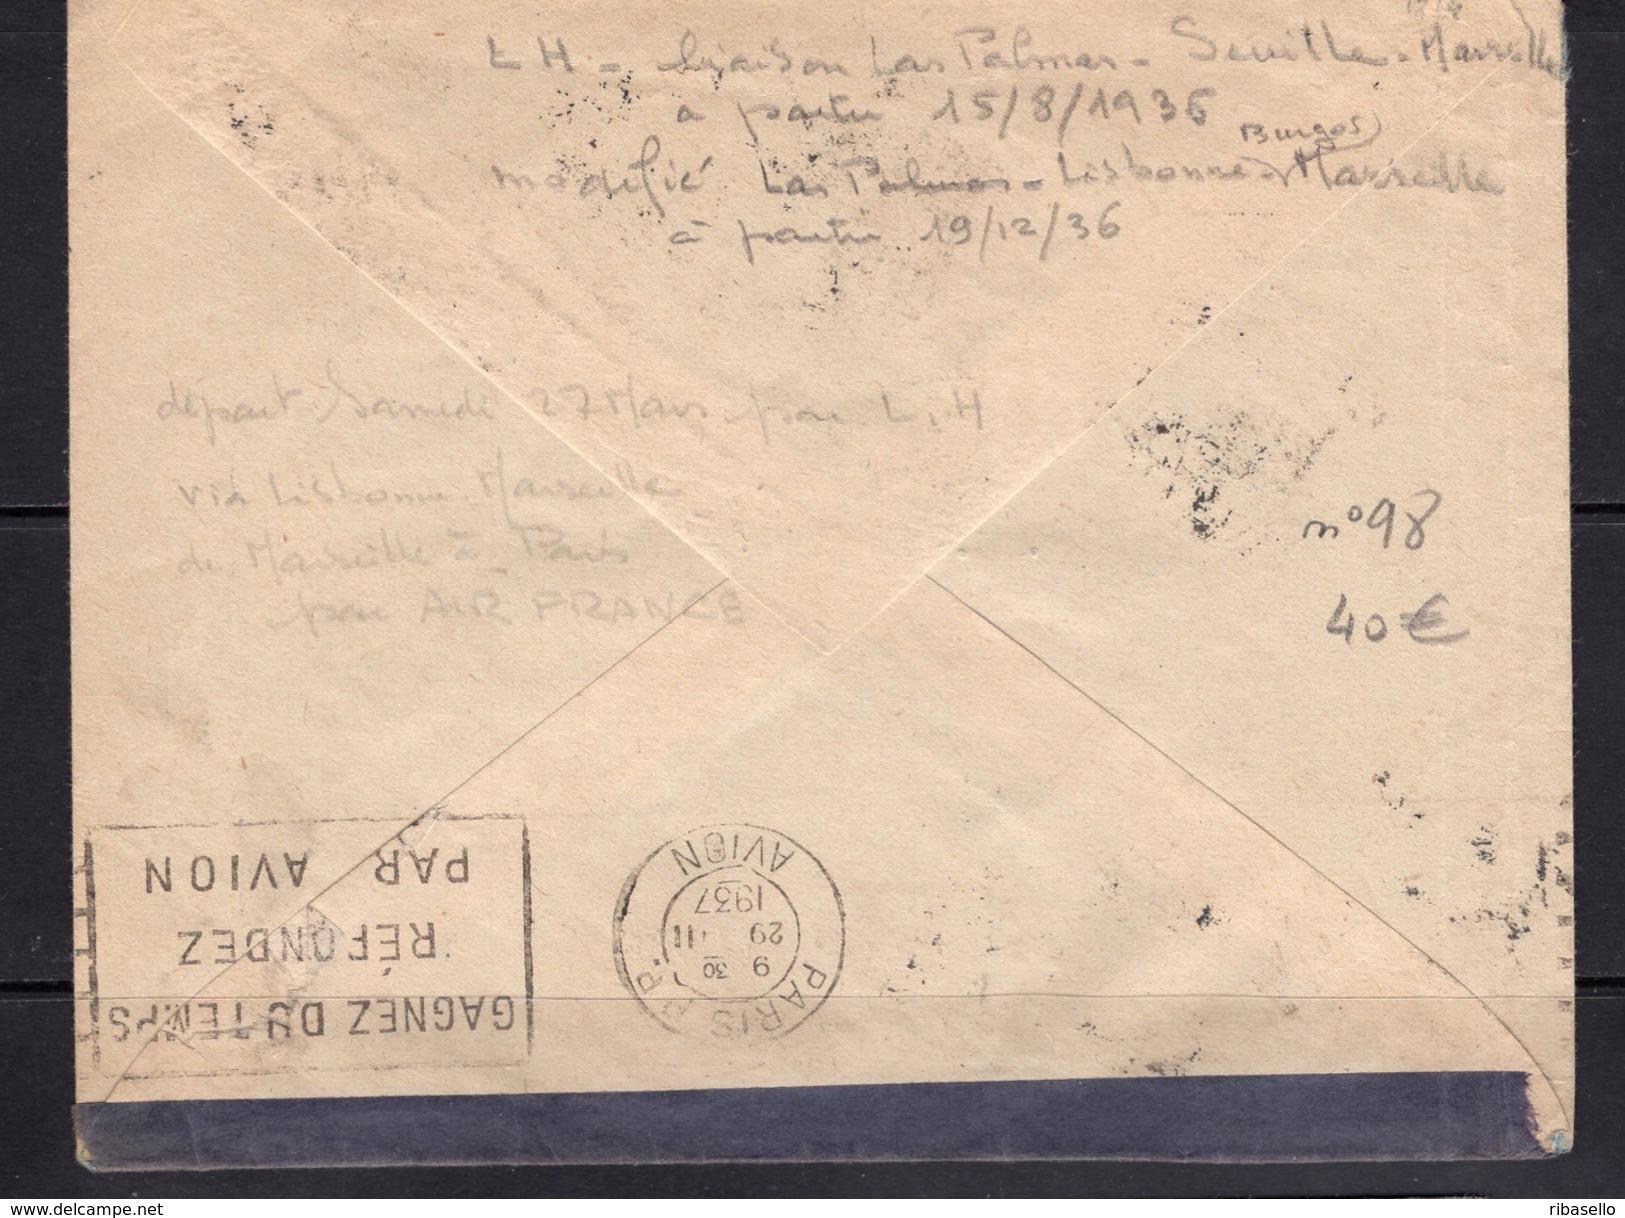 España 1937. Canarias. Carta De Las Palmas A Bruselas. Censura. - Marcas De Censura Nacional